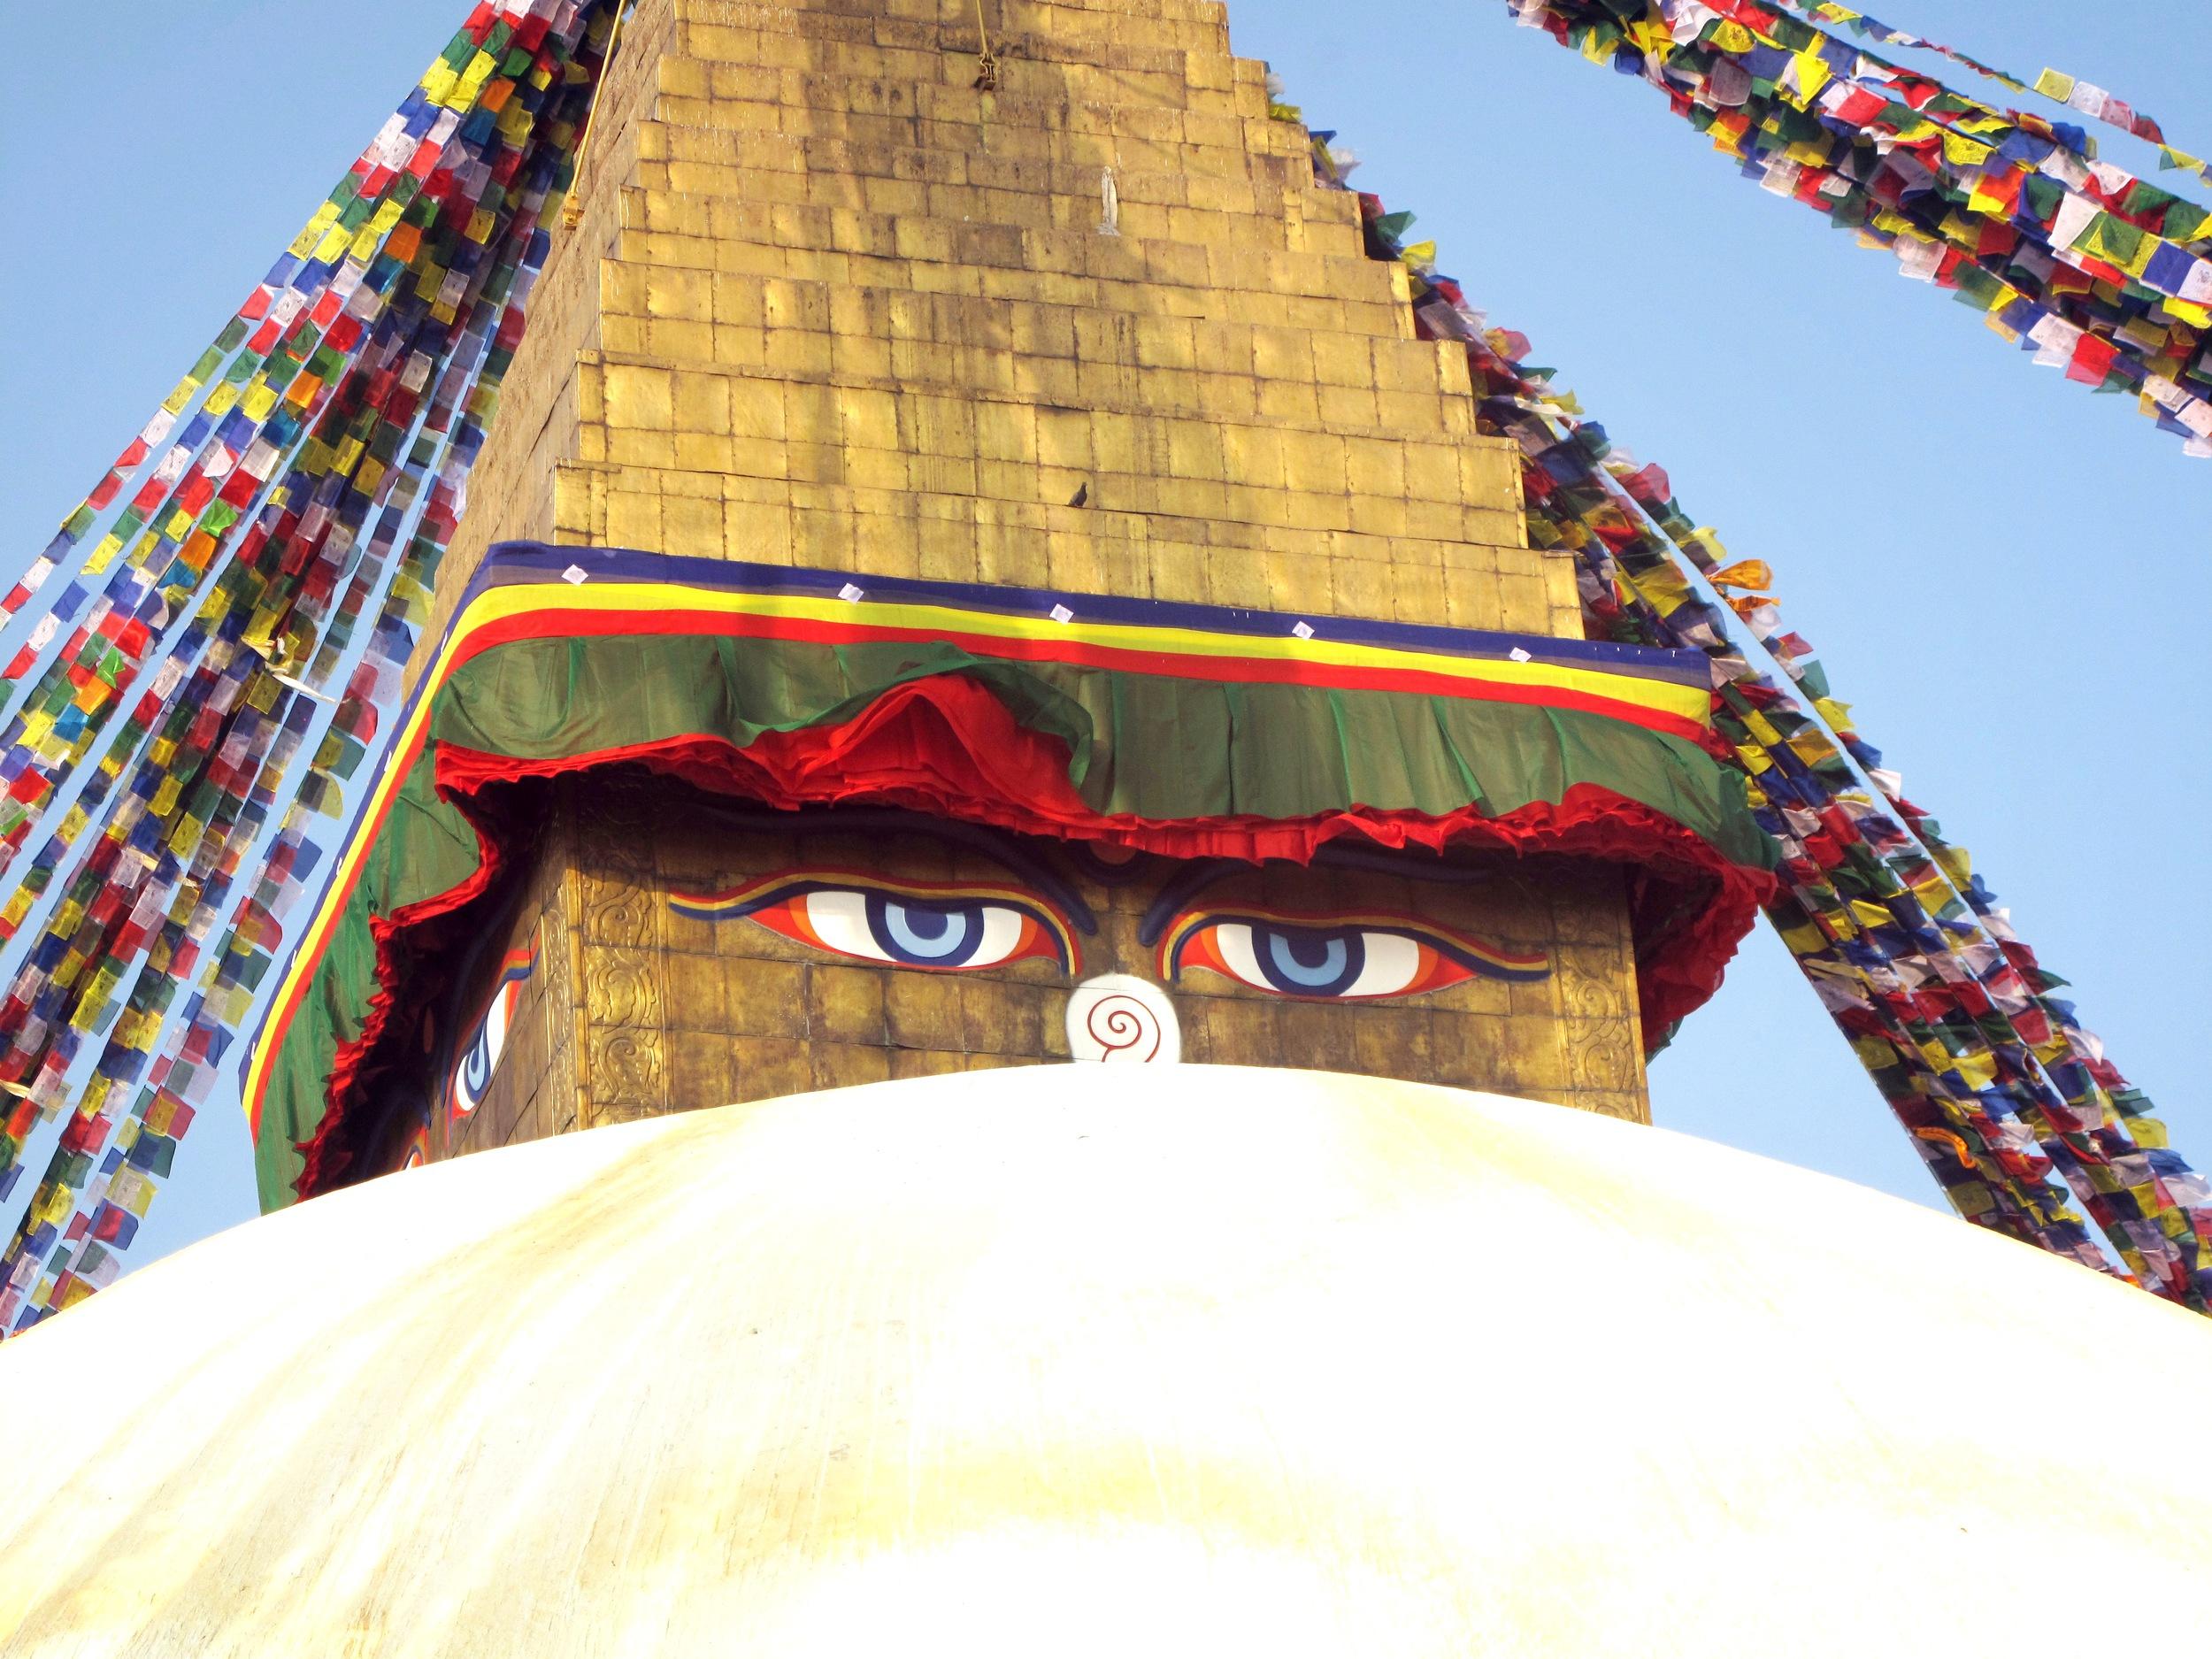 Kat_Bouddhanath stuppa_up close_eyes.jpg